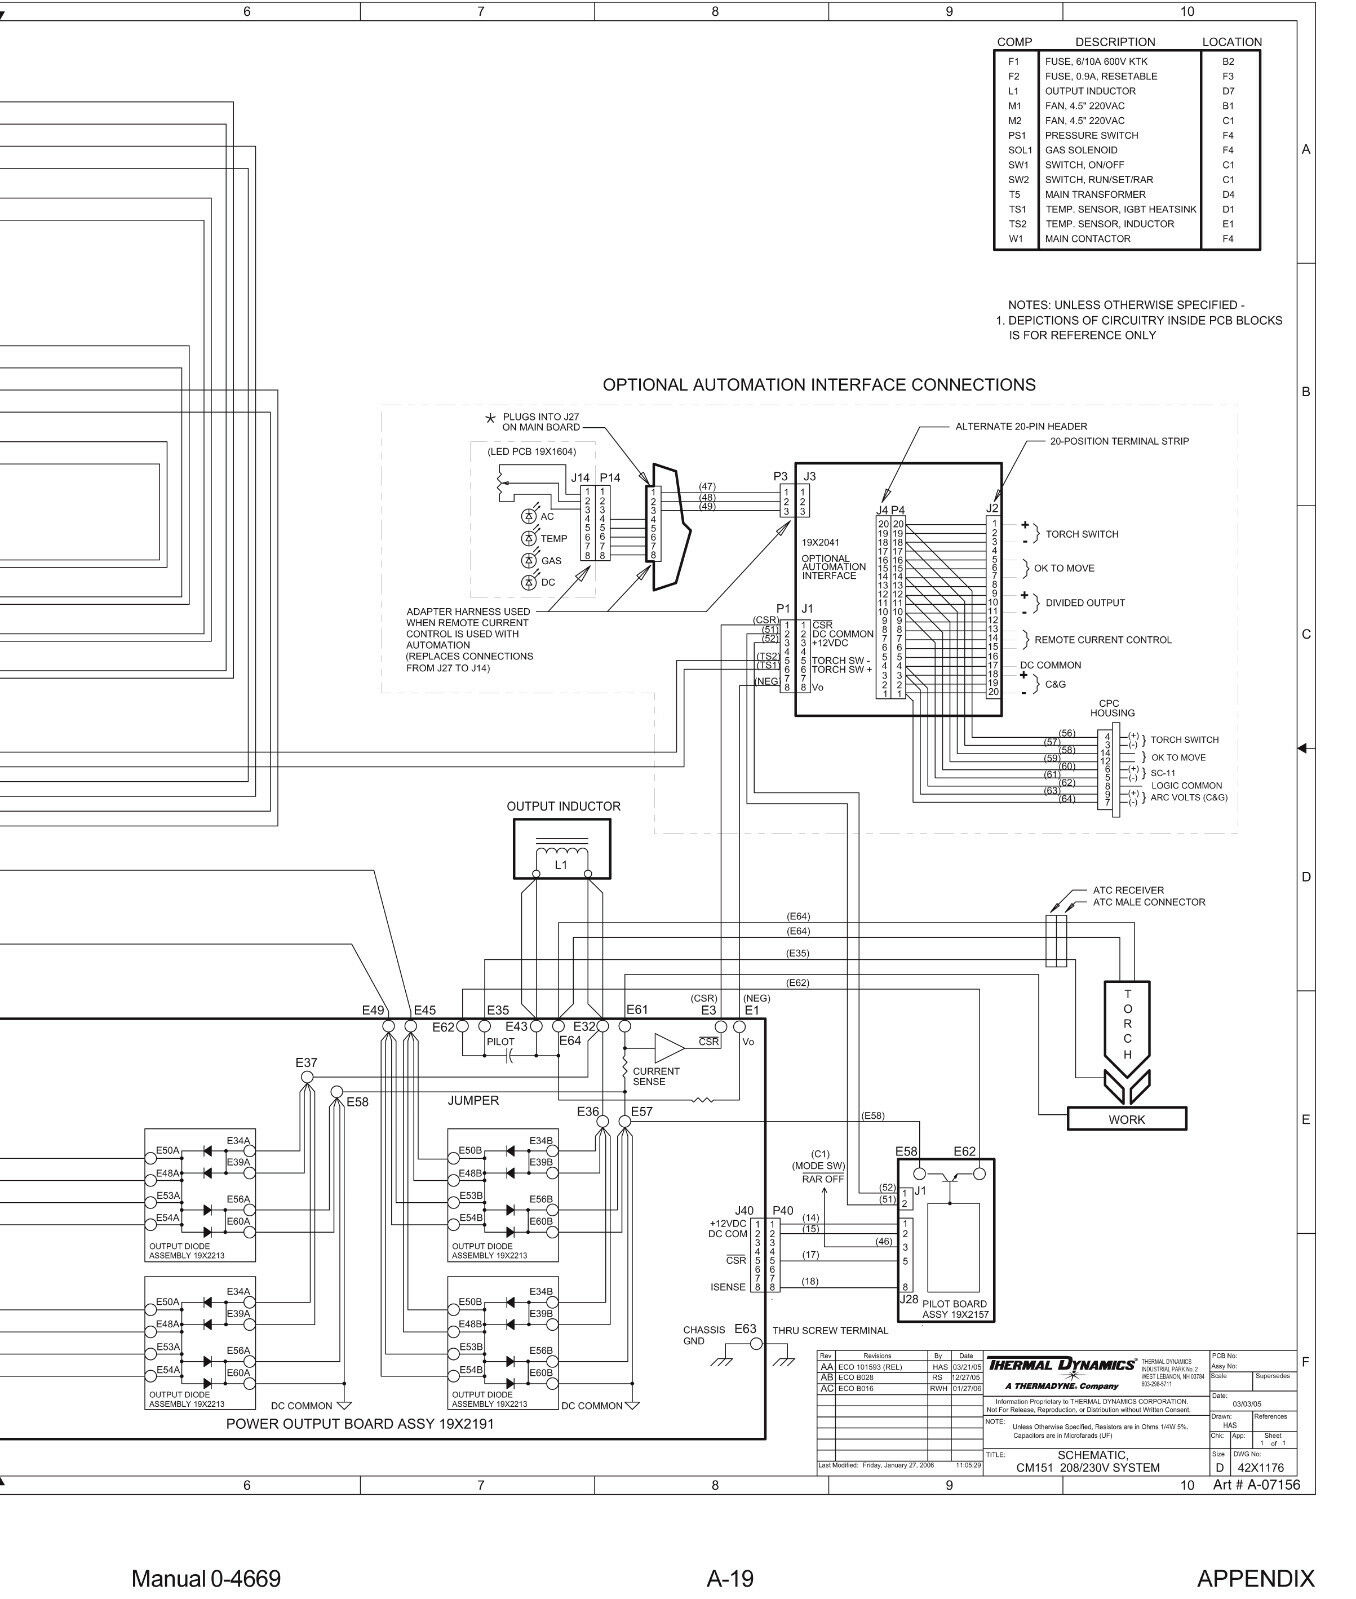 thermal dynamics cutmaster 151 plasma cutter service